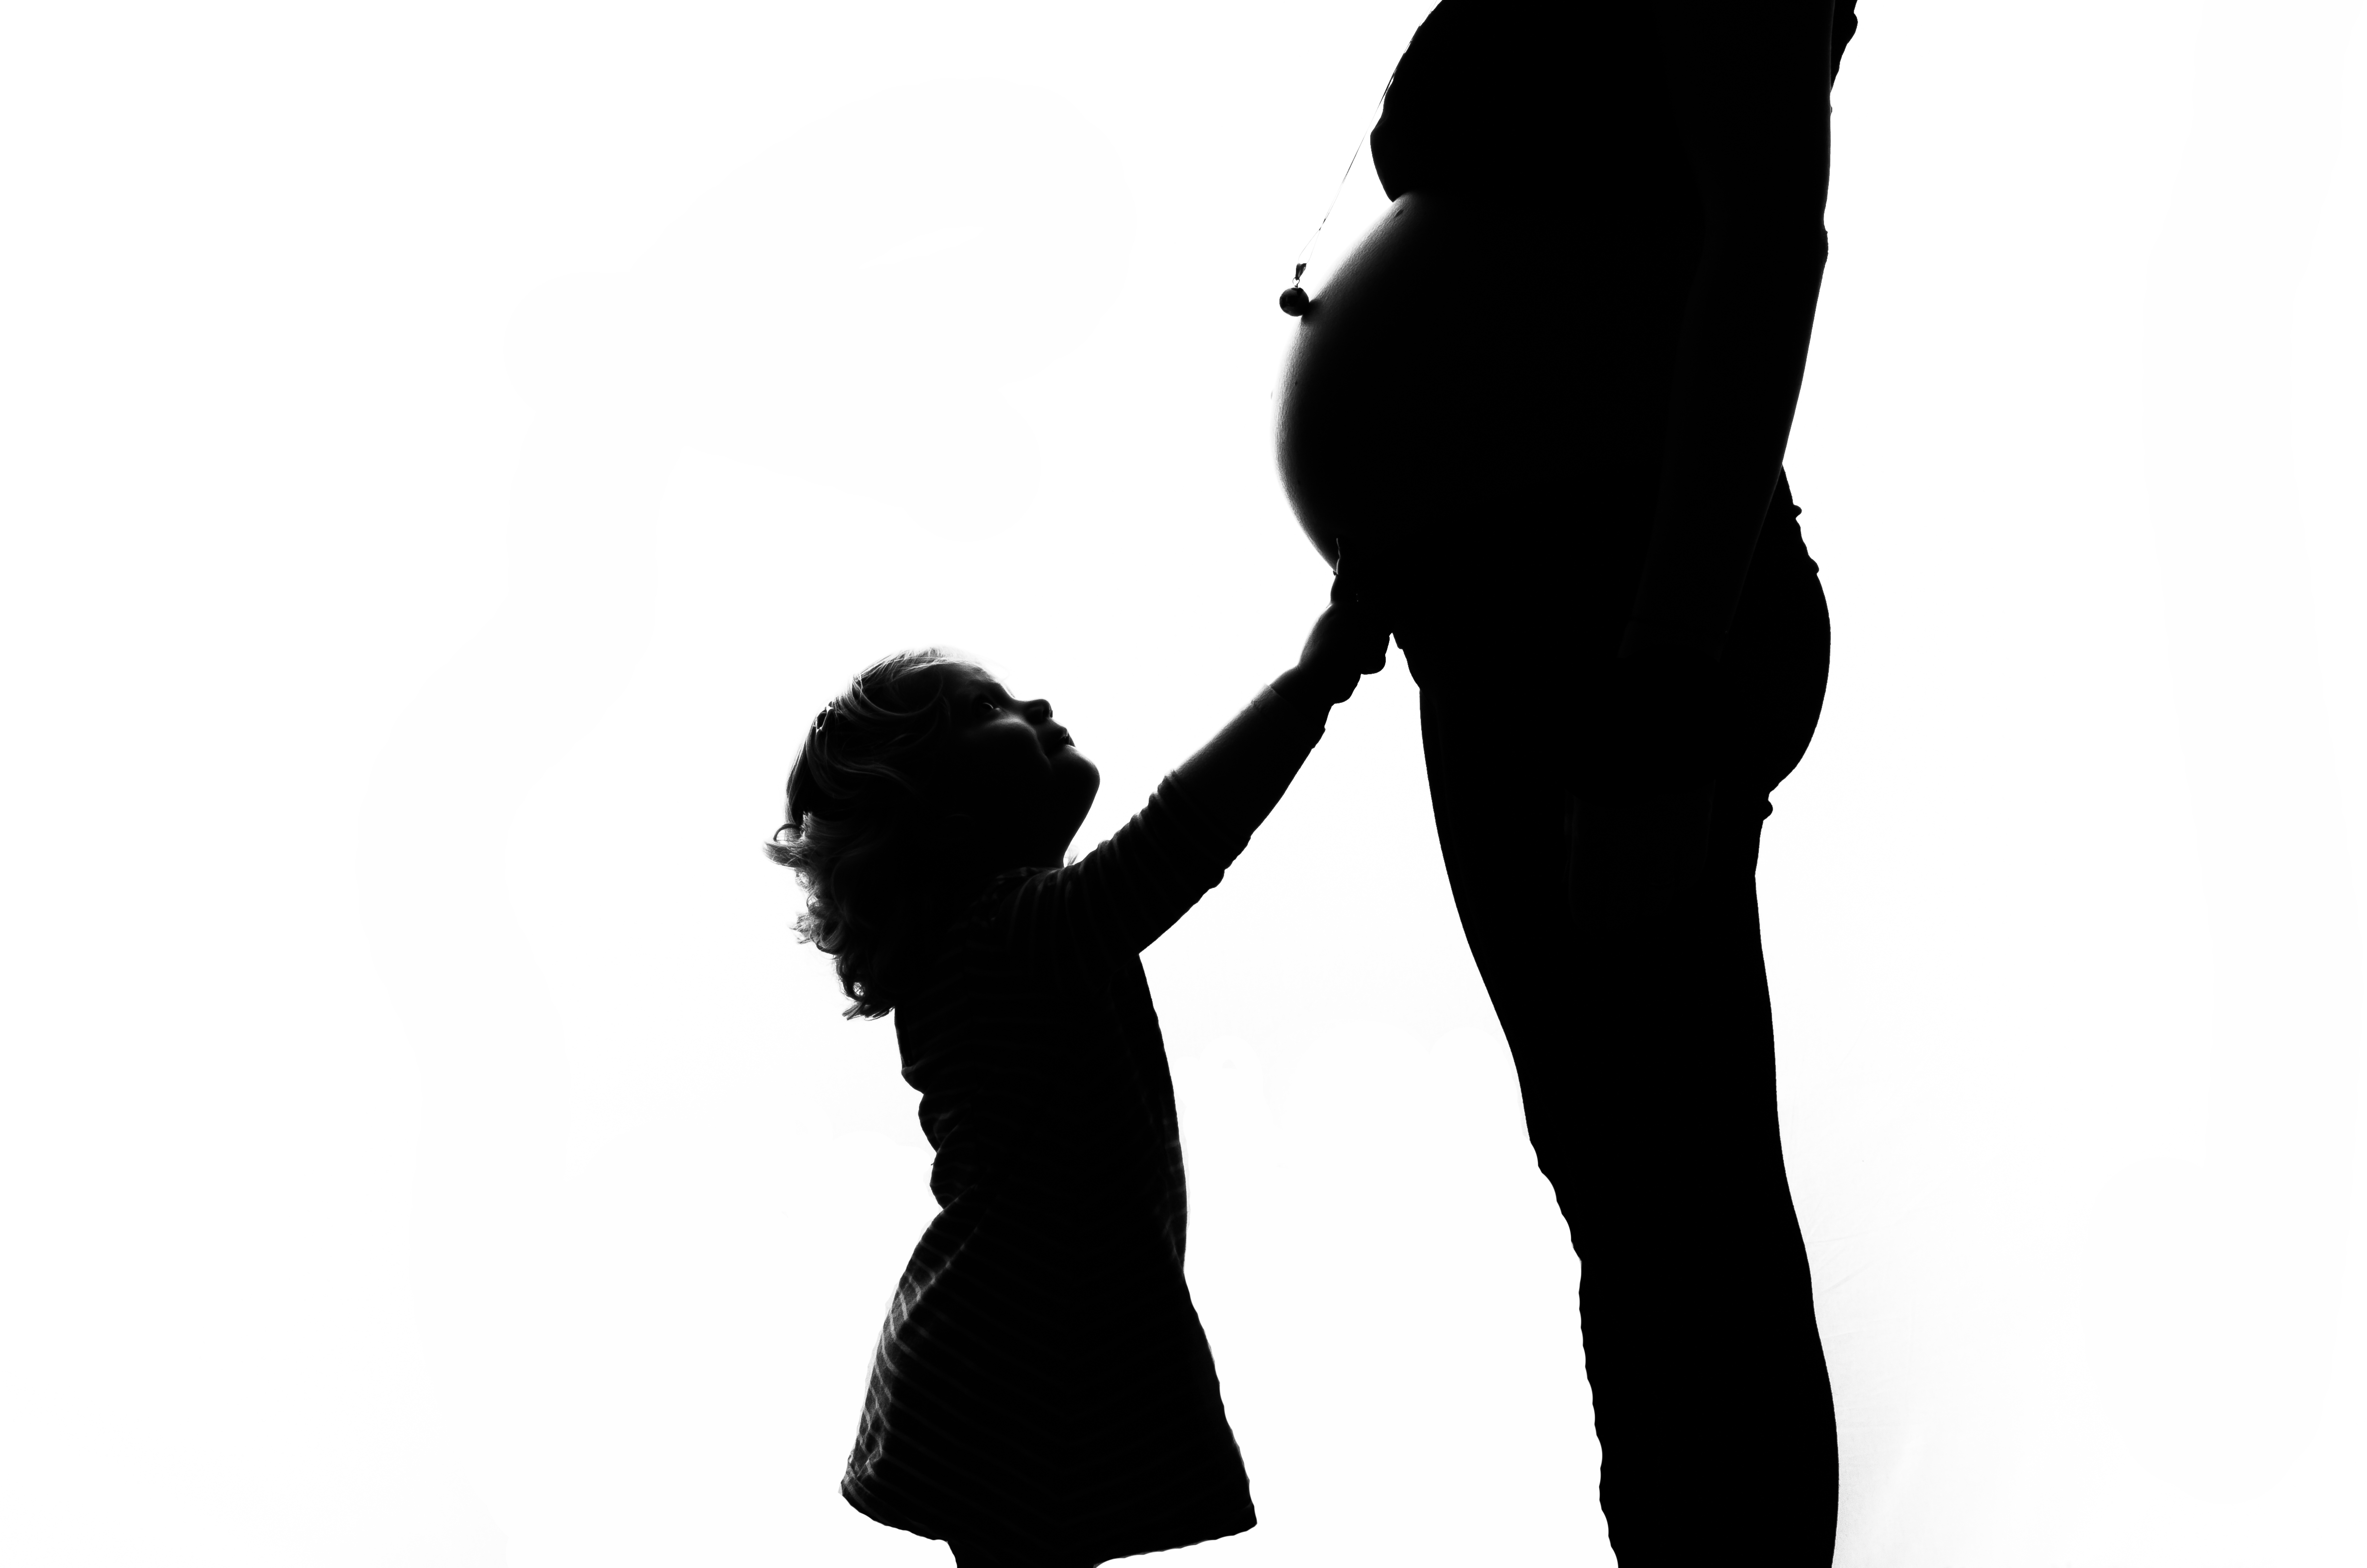 Maelou | grossesse, enfant